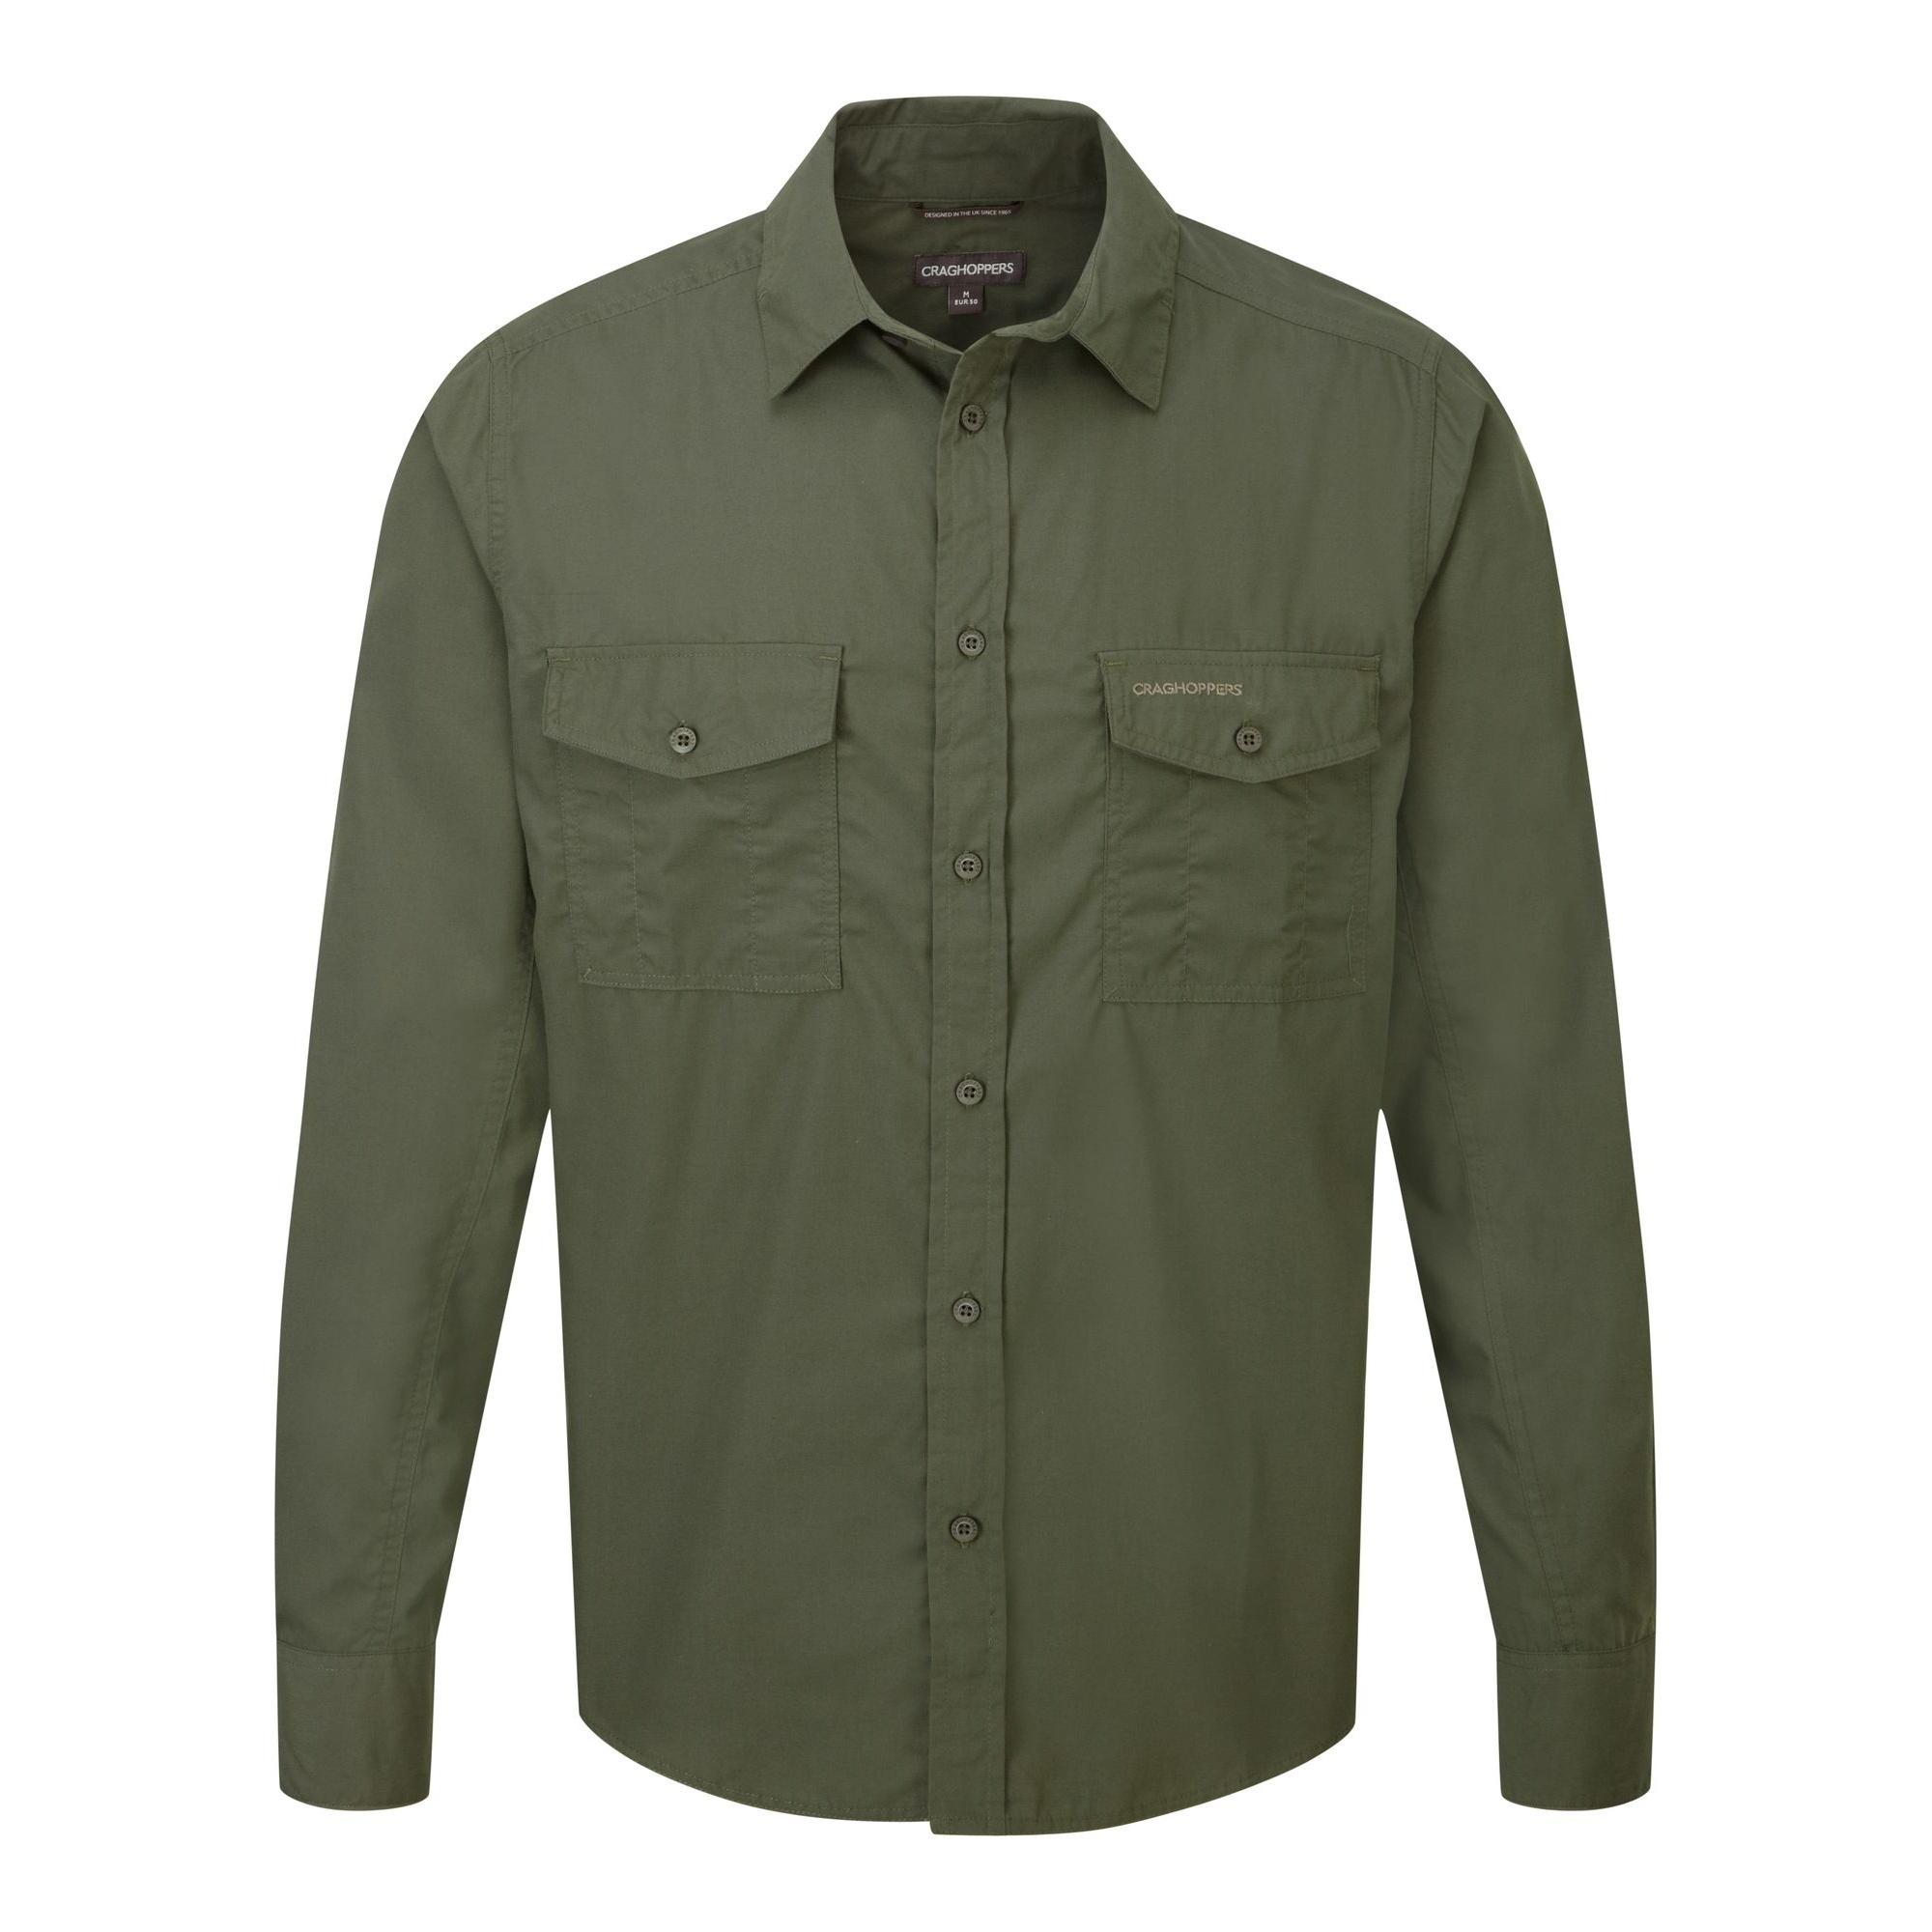 Craghoppers-Camiseta-de-manga-larga-modelo-Kiwi-para-hombre-CG180